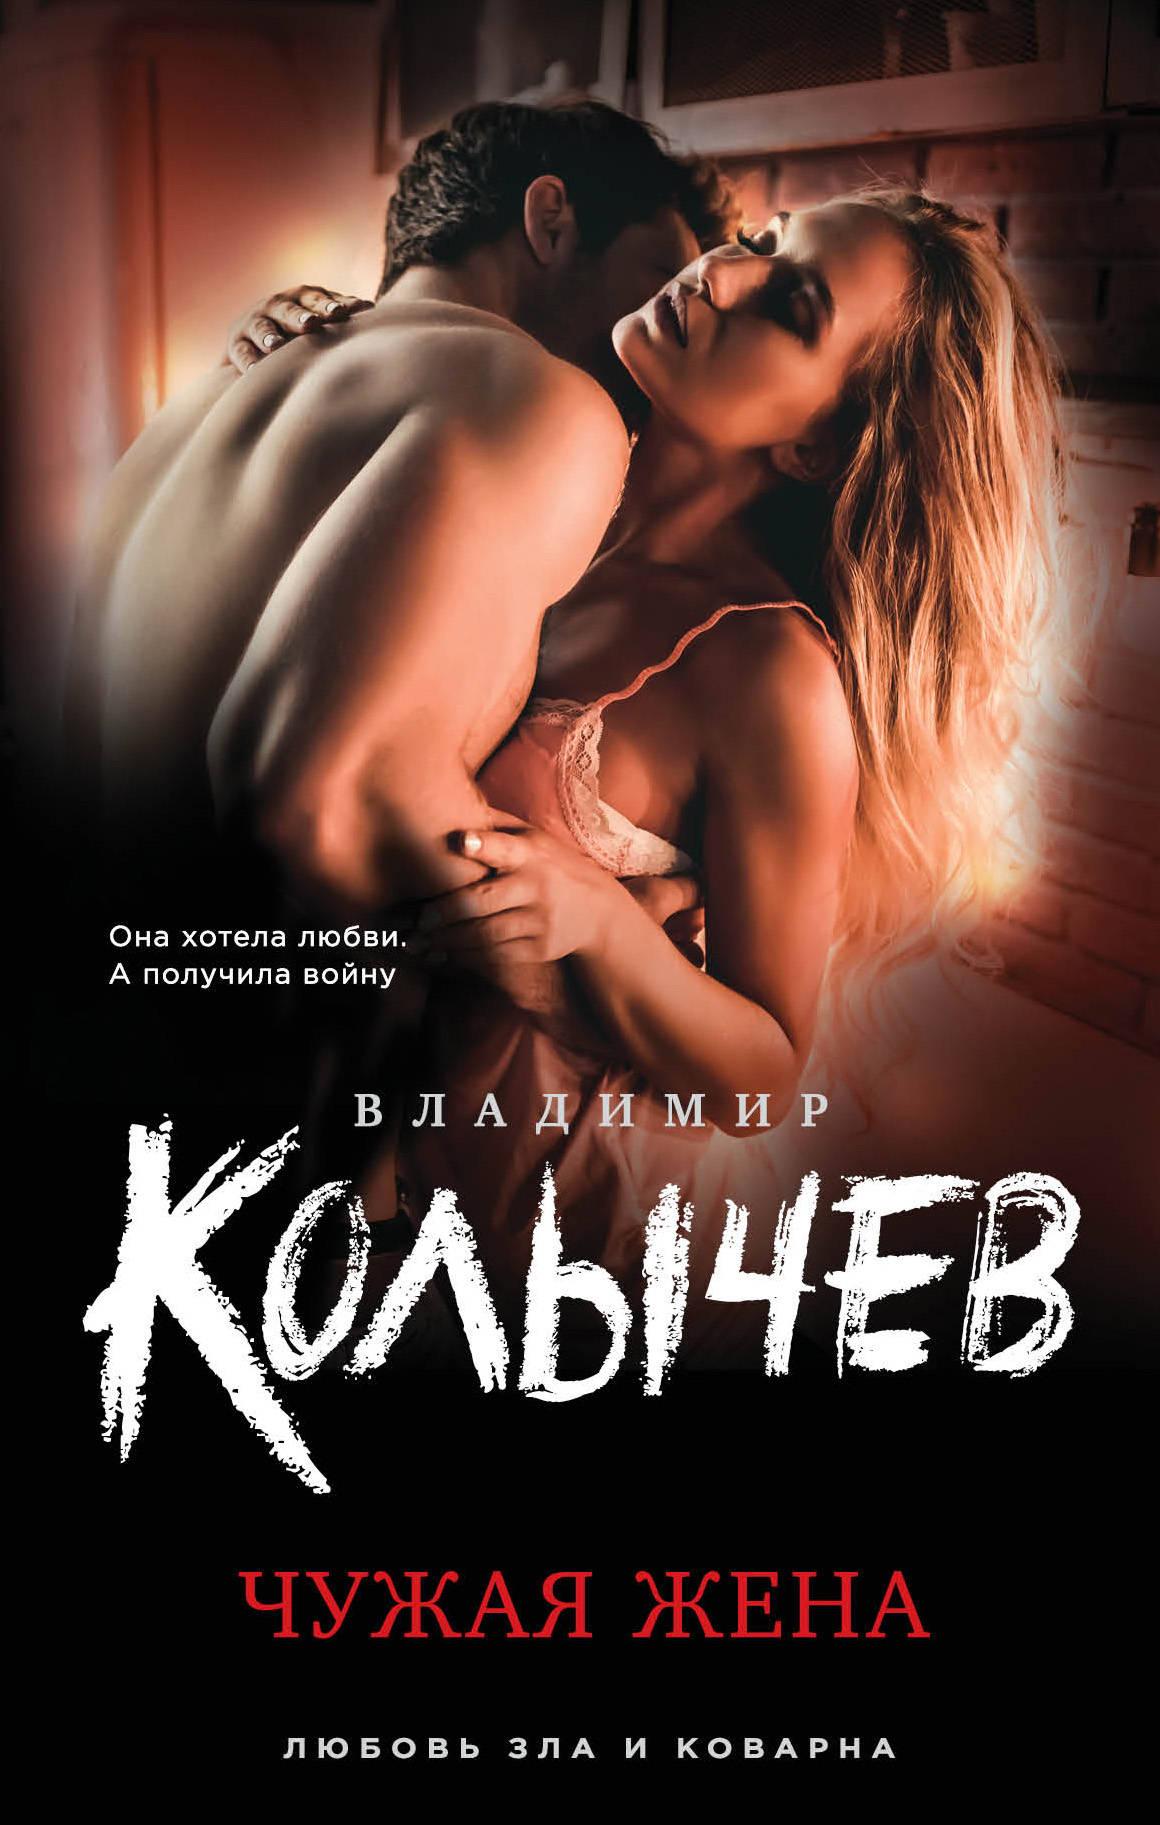 Владимир Колычев Чужая жена